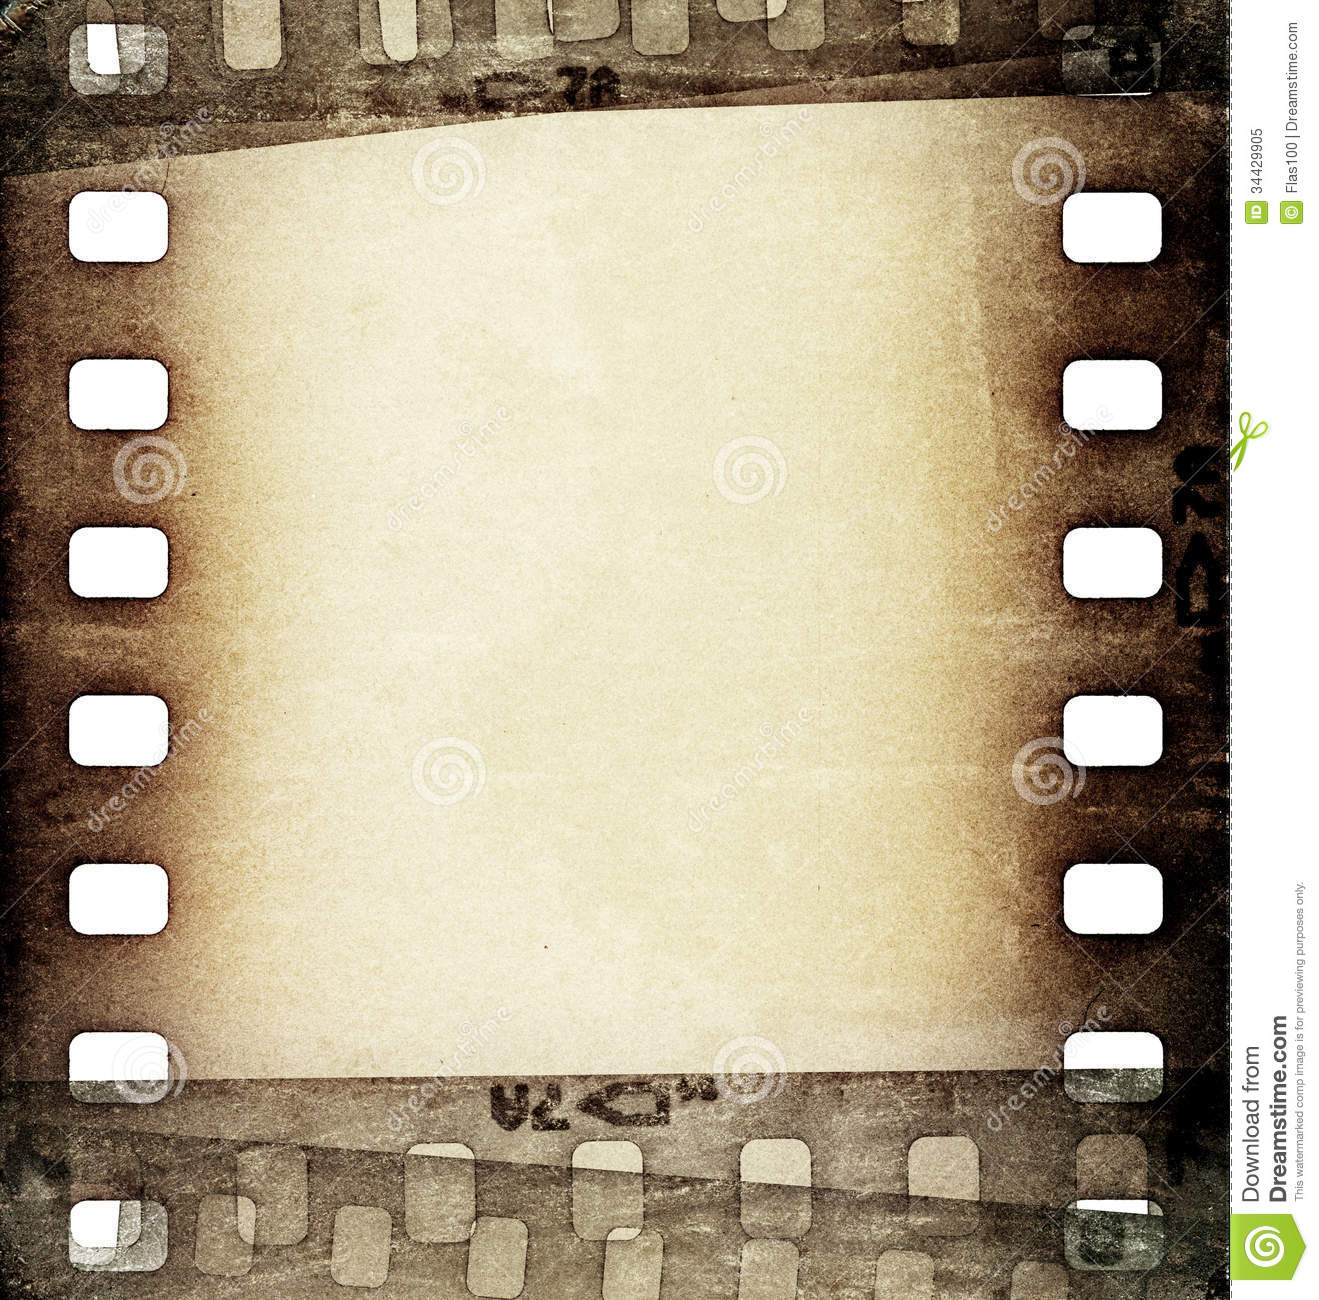 Grunge Film Strip Backgrounds 1319x1300